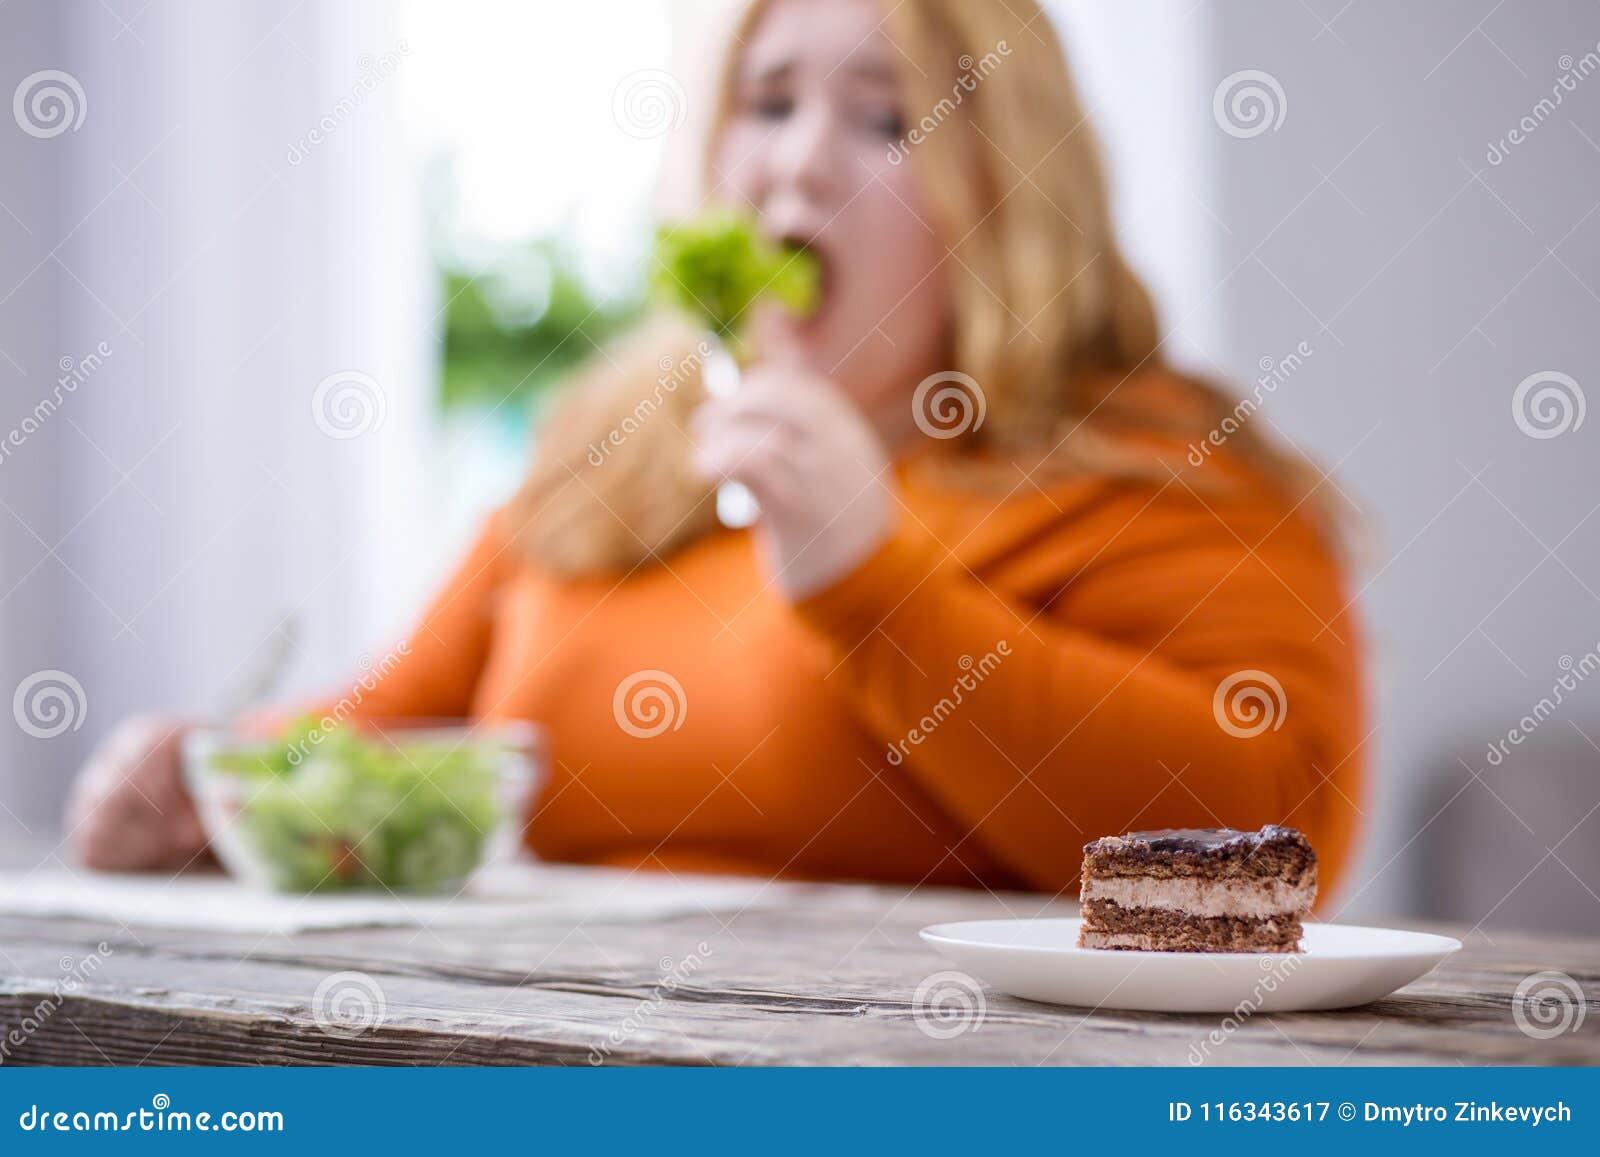 Desolate plump woman looking at cookies